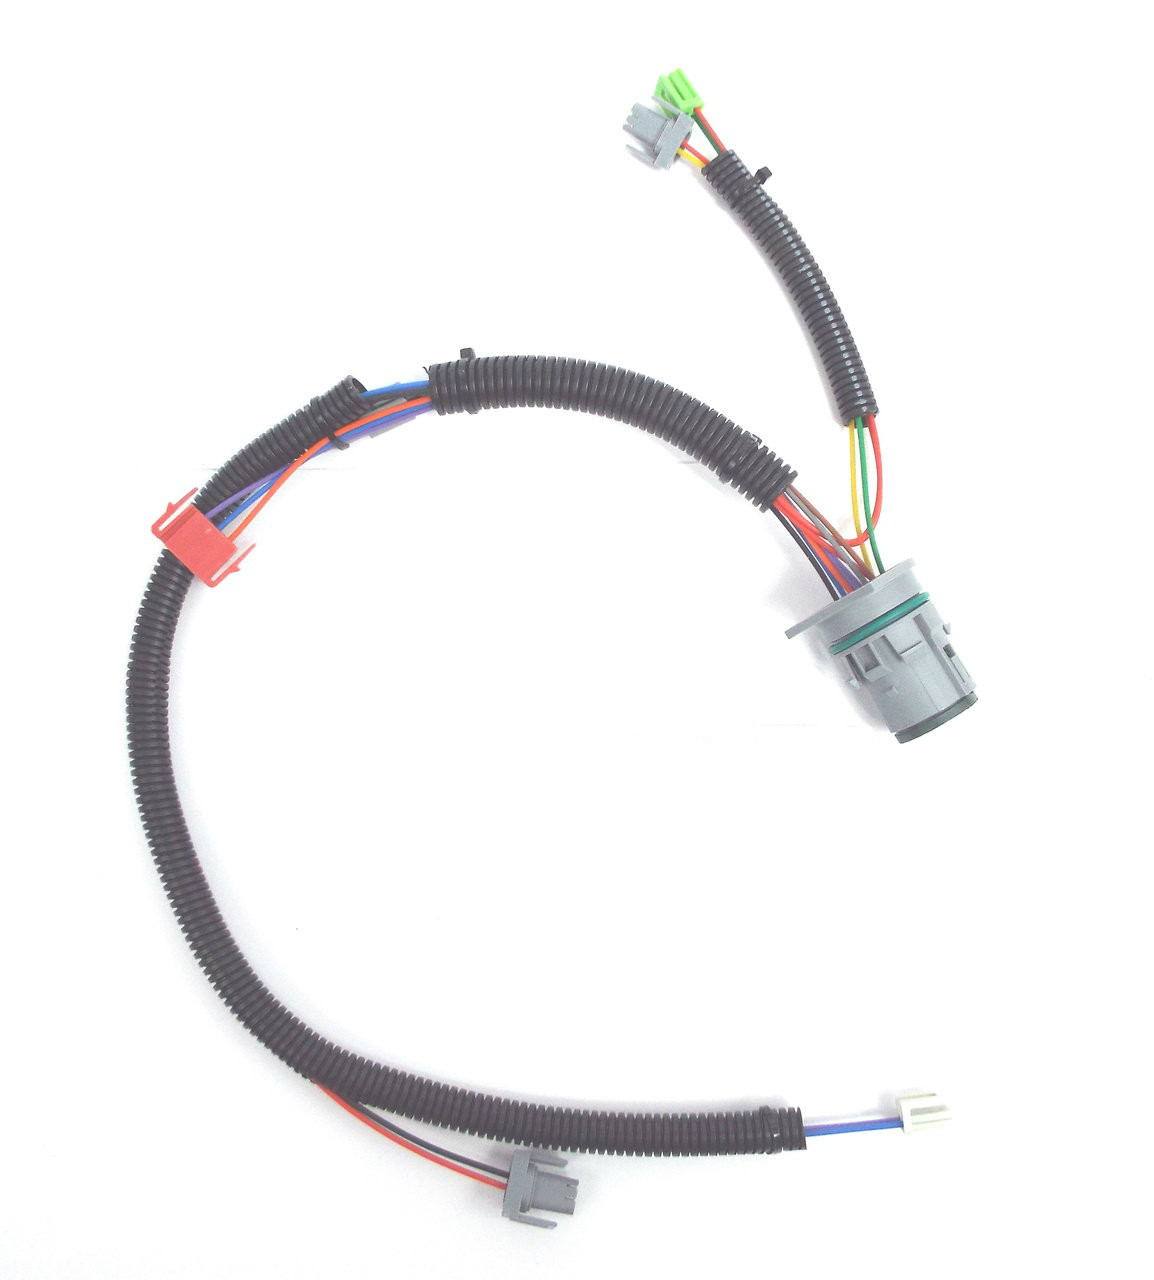 4l80e internal wiring harness 2004 up 24200161 global 4l80e wiring harness diagram 4l80e wiring harness [ 1154 x 1280 Pixel ]